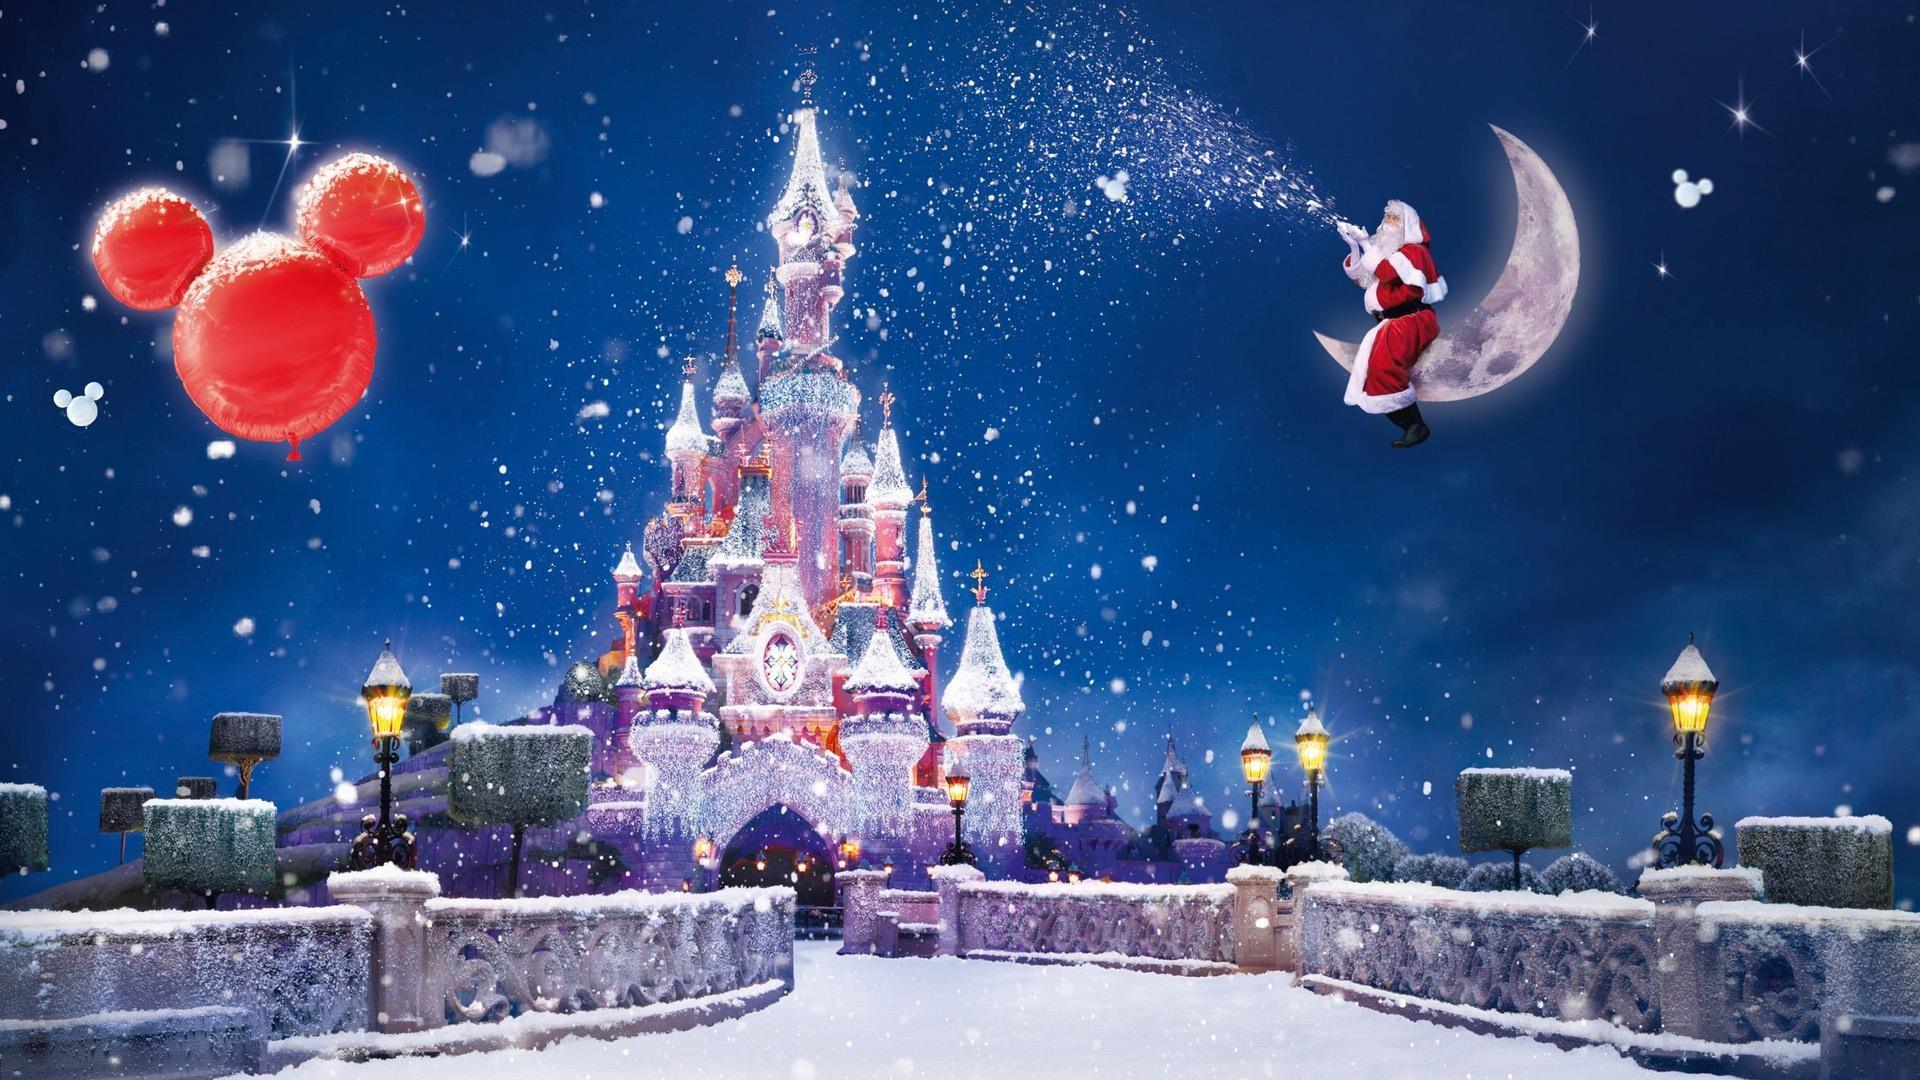 Beautiful Merry Christmas Lights Wallpapers